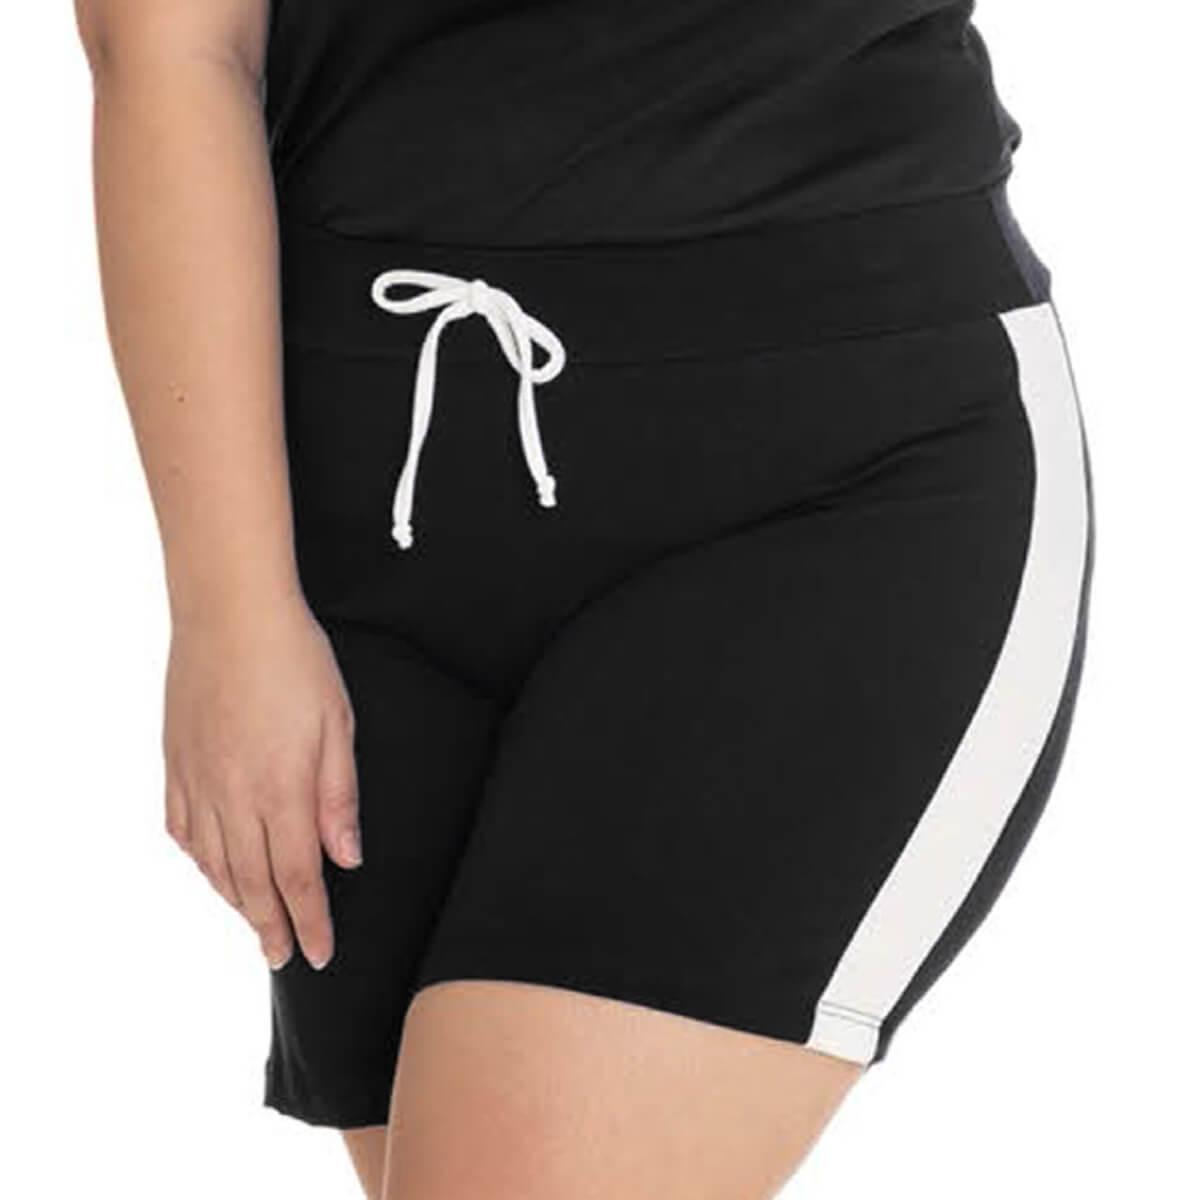 Shorts Feminino Plus Size Viscolycra Casual com Recorte Branco